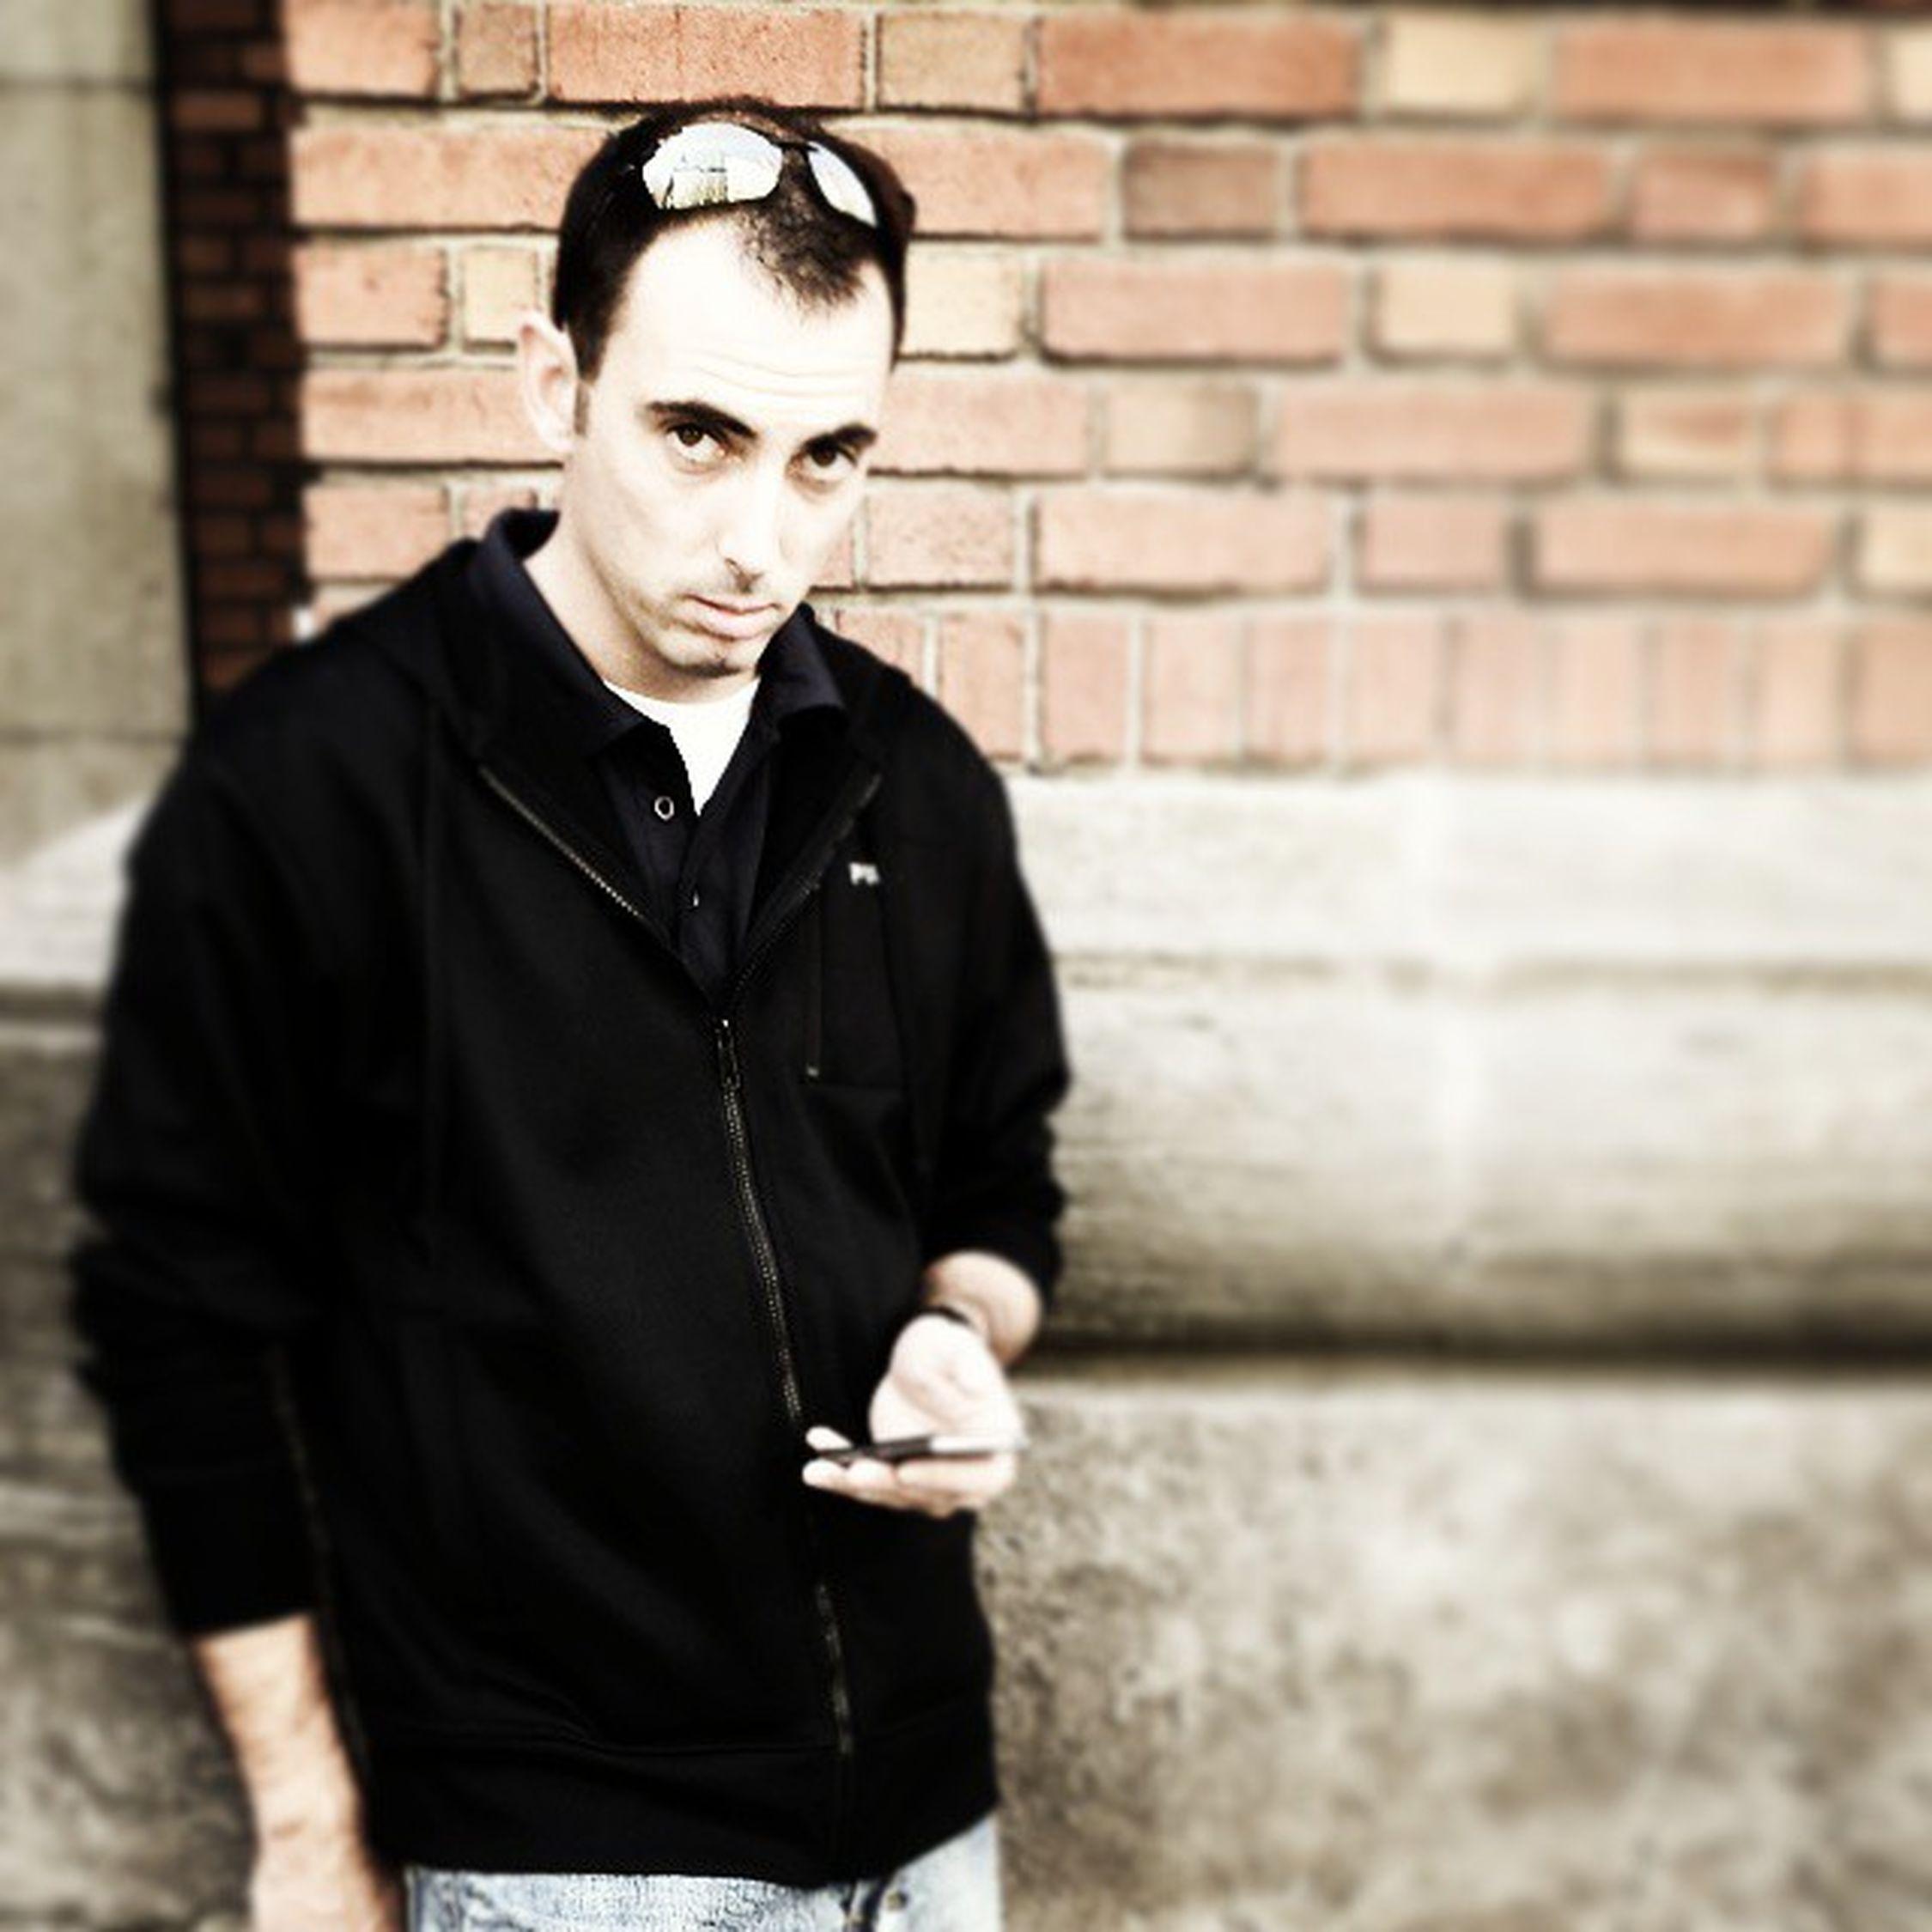 Peelstreet Montréal WorkingHard Breaktime